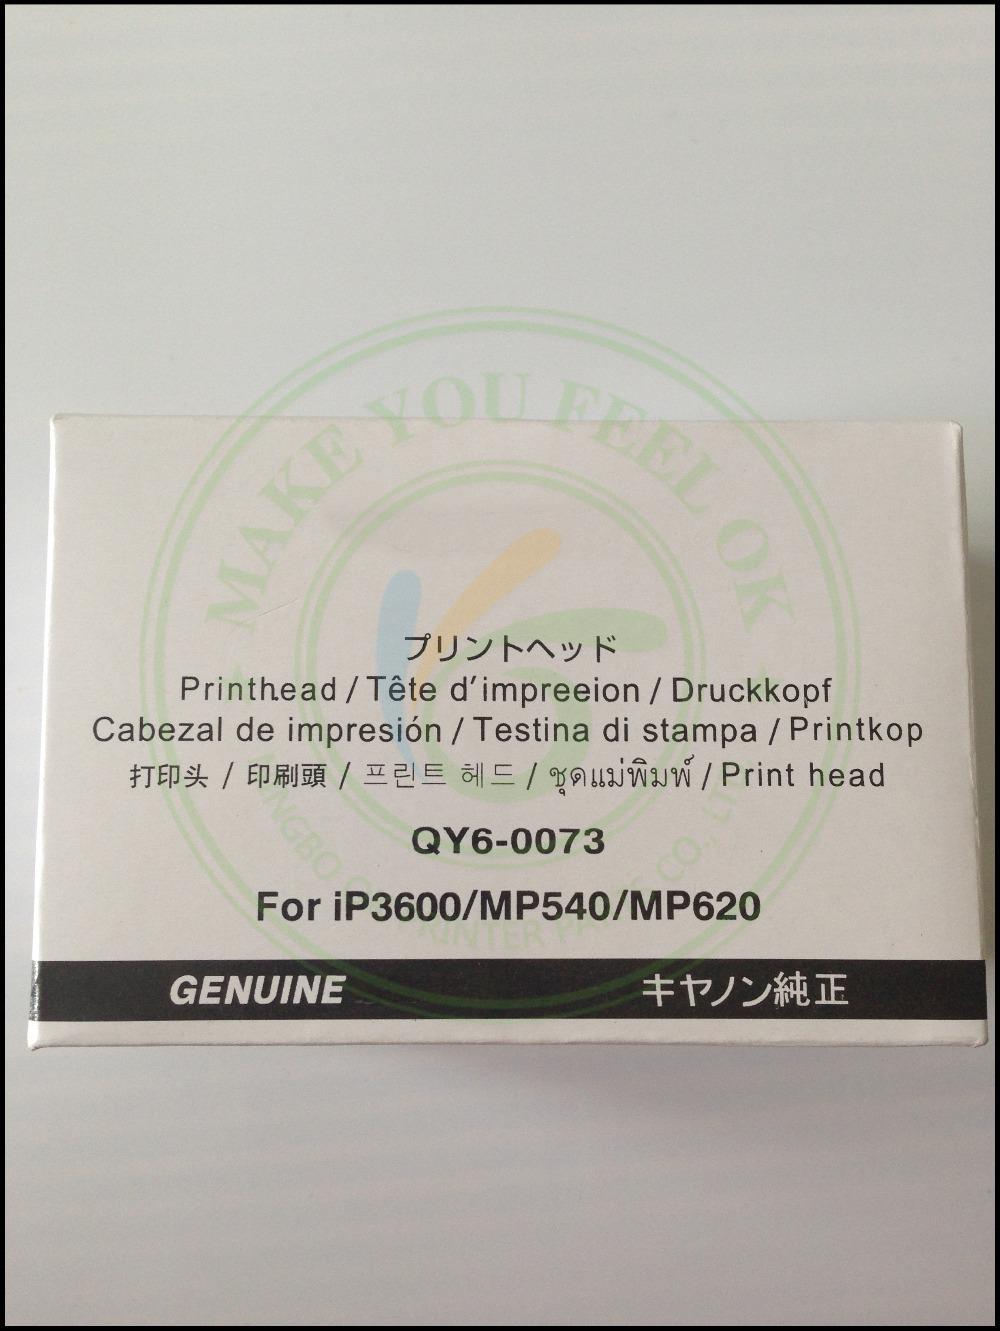 ORIGINAL NEW QY6-0073 Printhead Print Head for Canon iP3600 iP3680 MP540 MP560 MP568 MP620 MX860 MX868 MX870 MX878 MG5140 MG5180(China (Mainland))